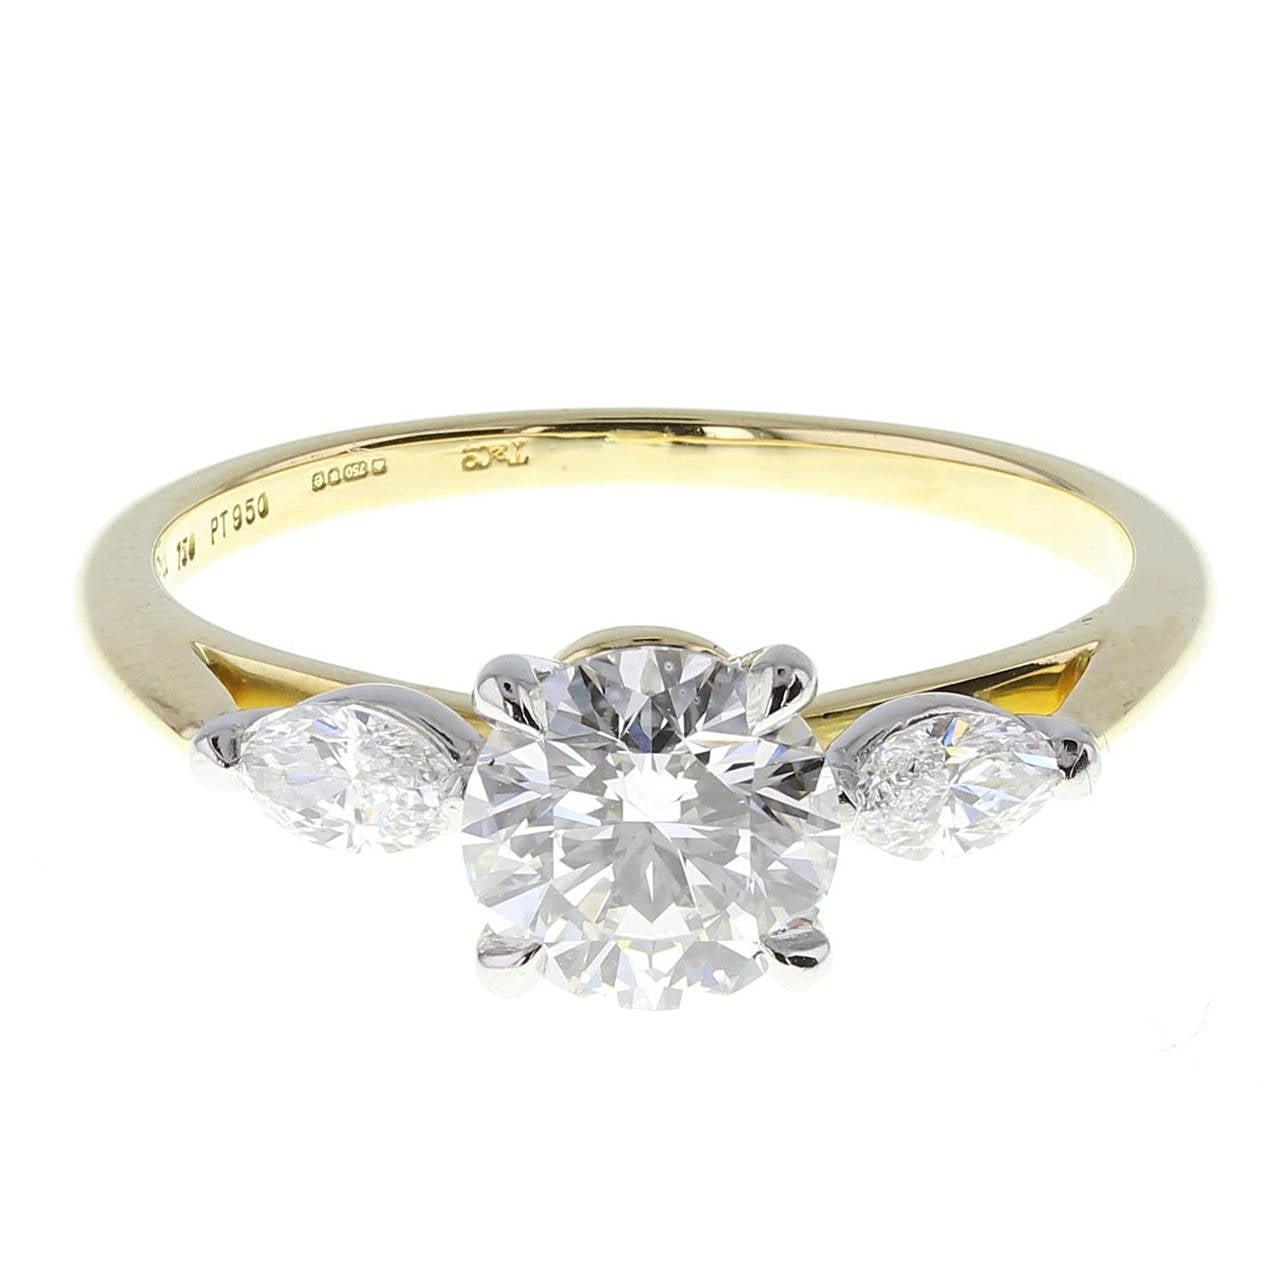 Engagement Rings Newcastle: M1764a_l.jpeg